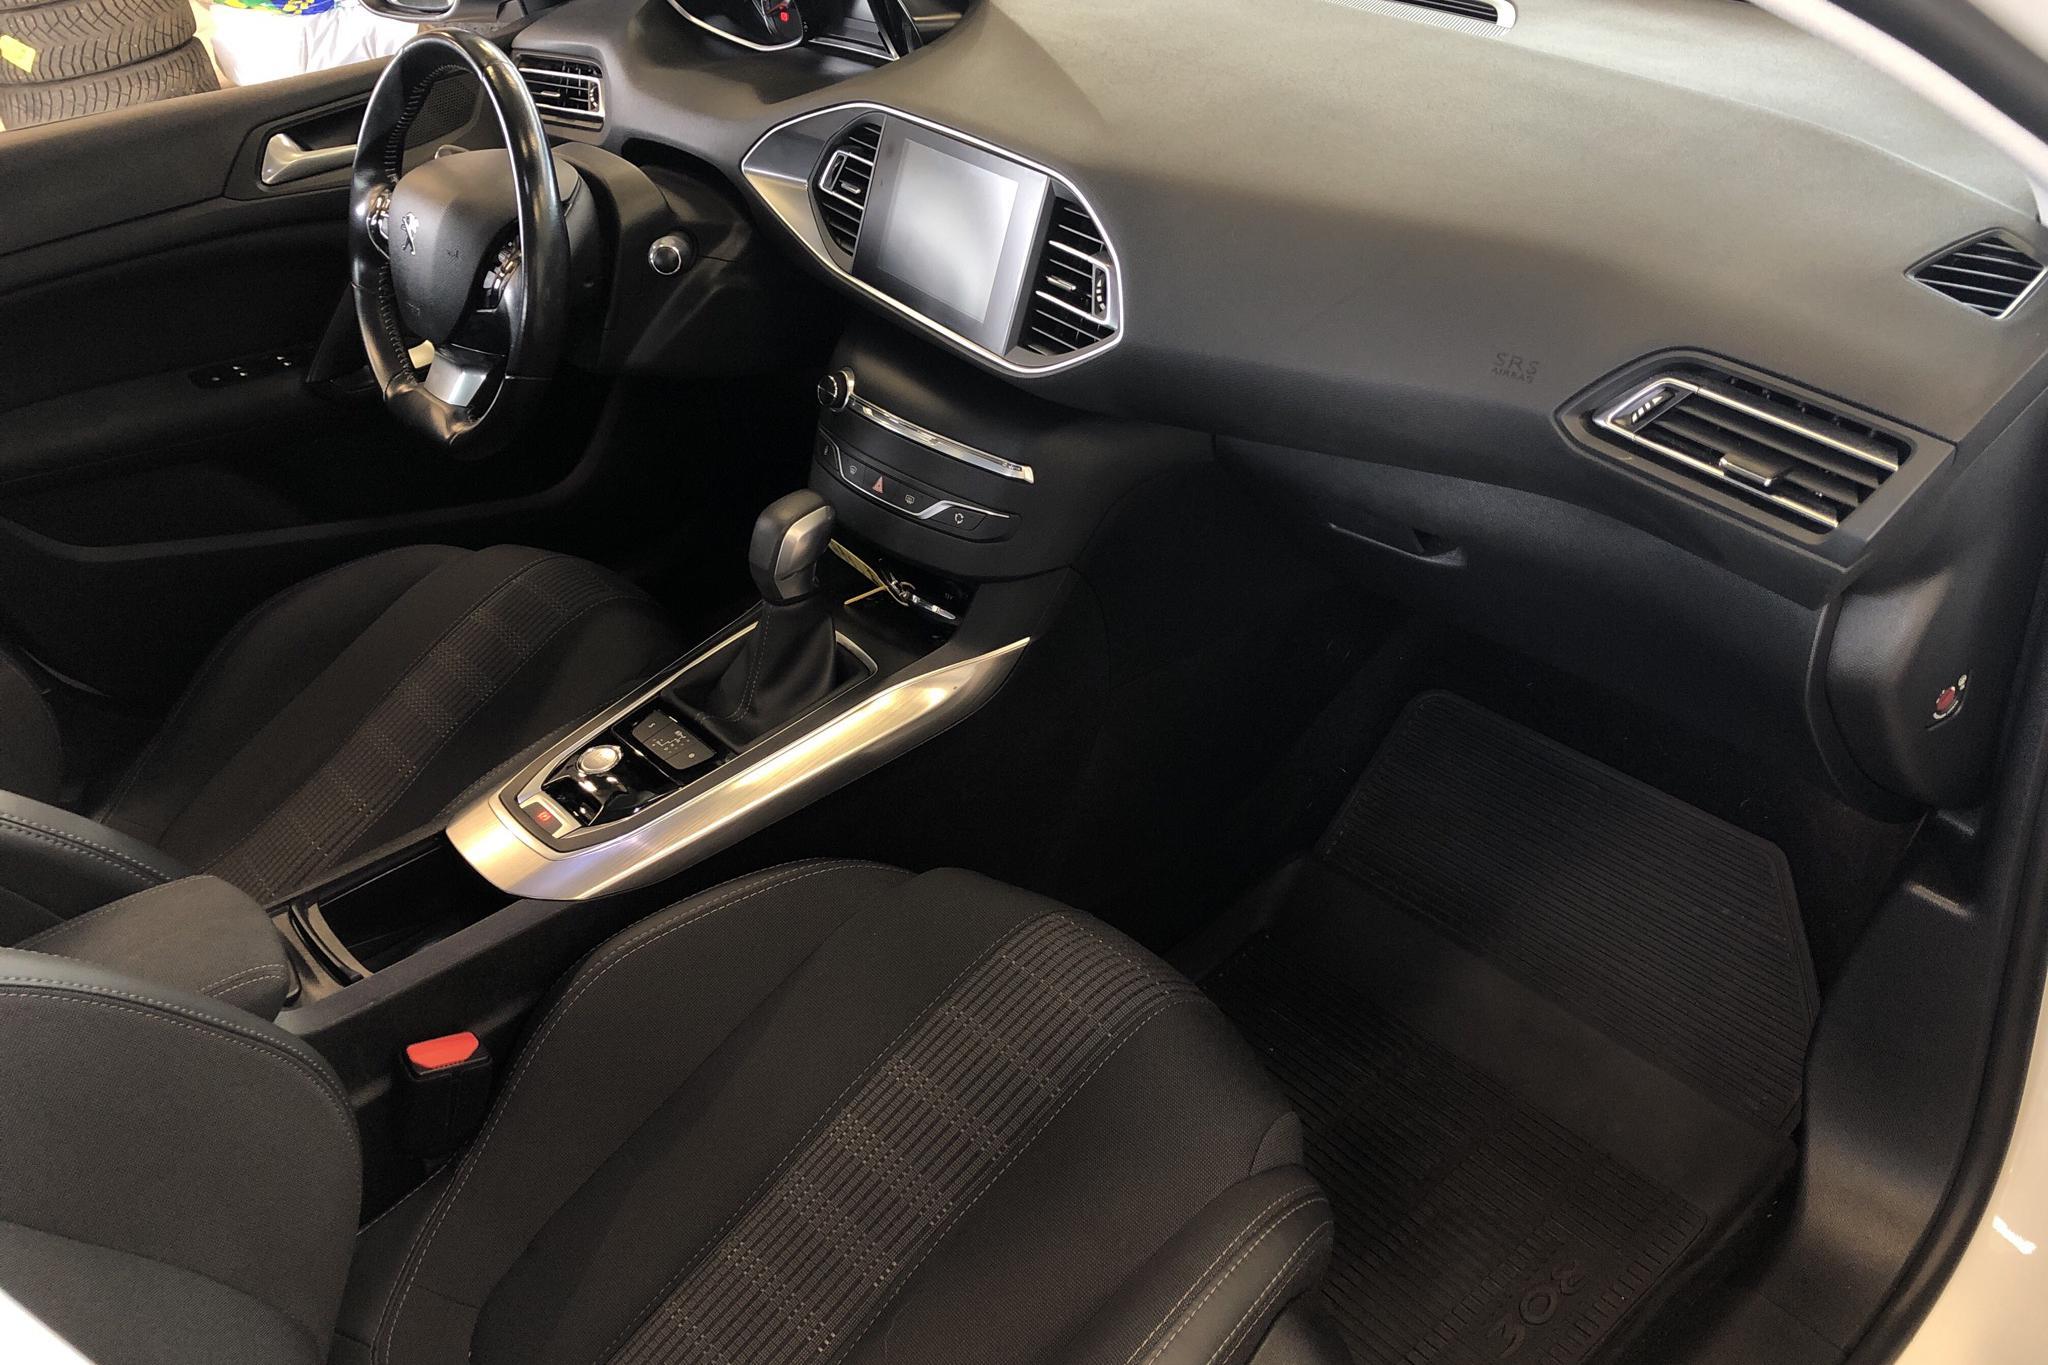 Peugeot 308 SW BlueHDi (120hk) - 123 690 km - Automatic - 2018